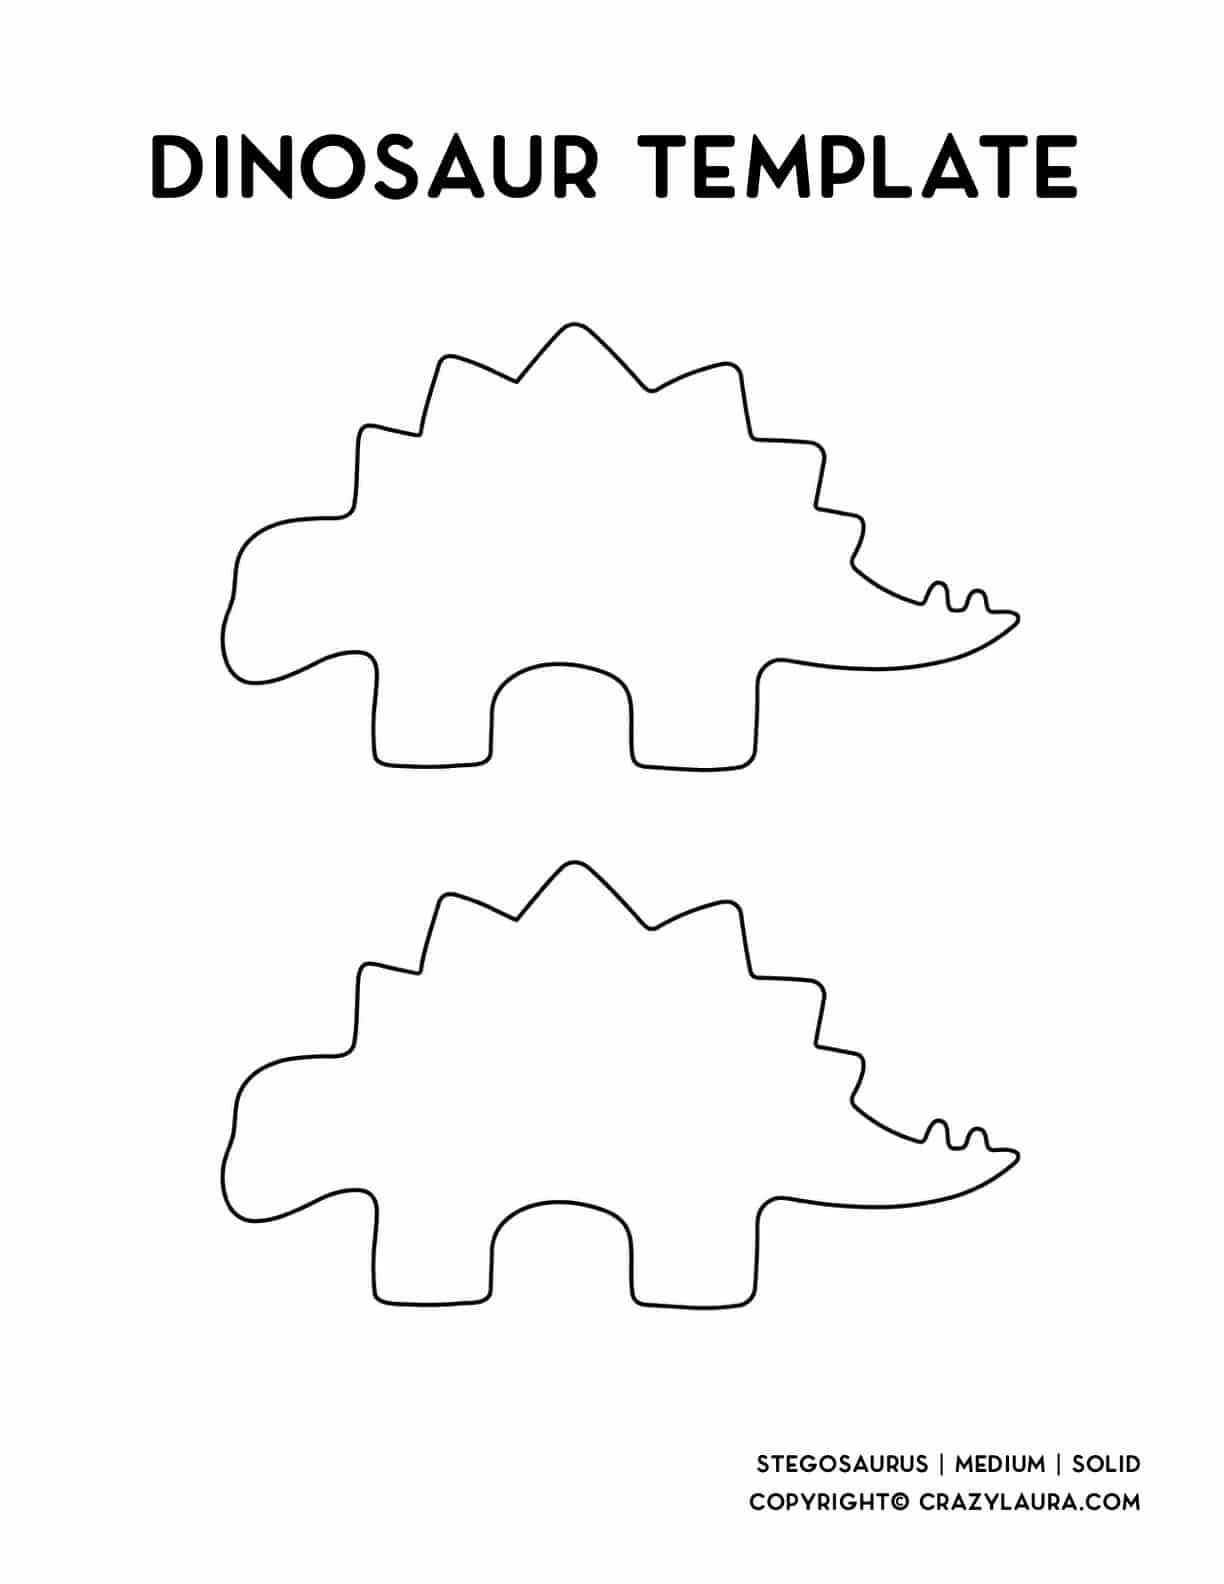 free printable template for stegosaurus